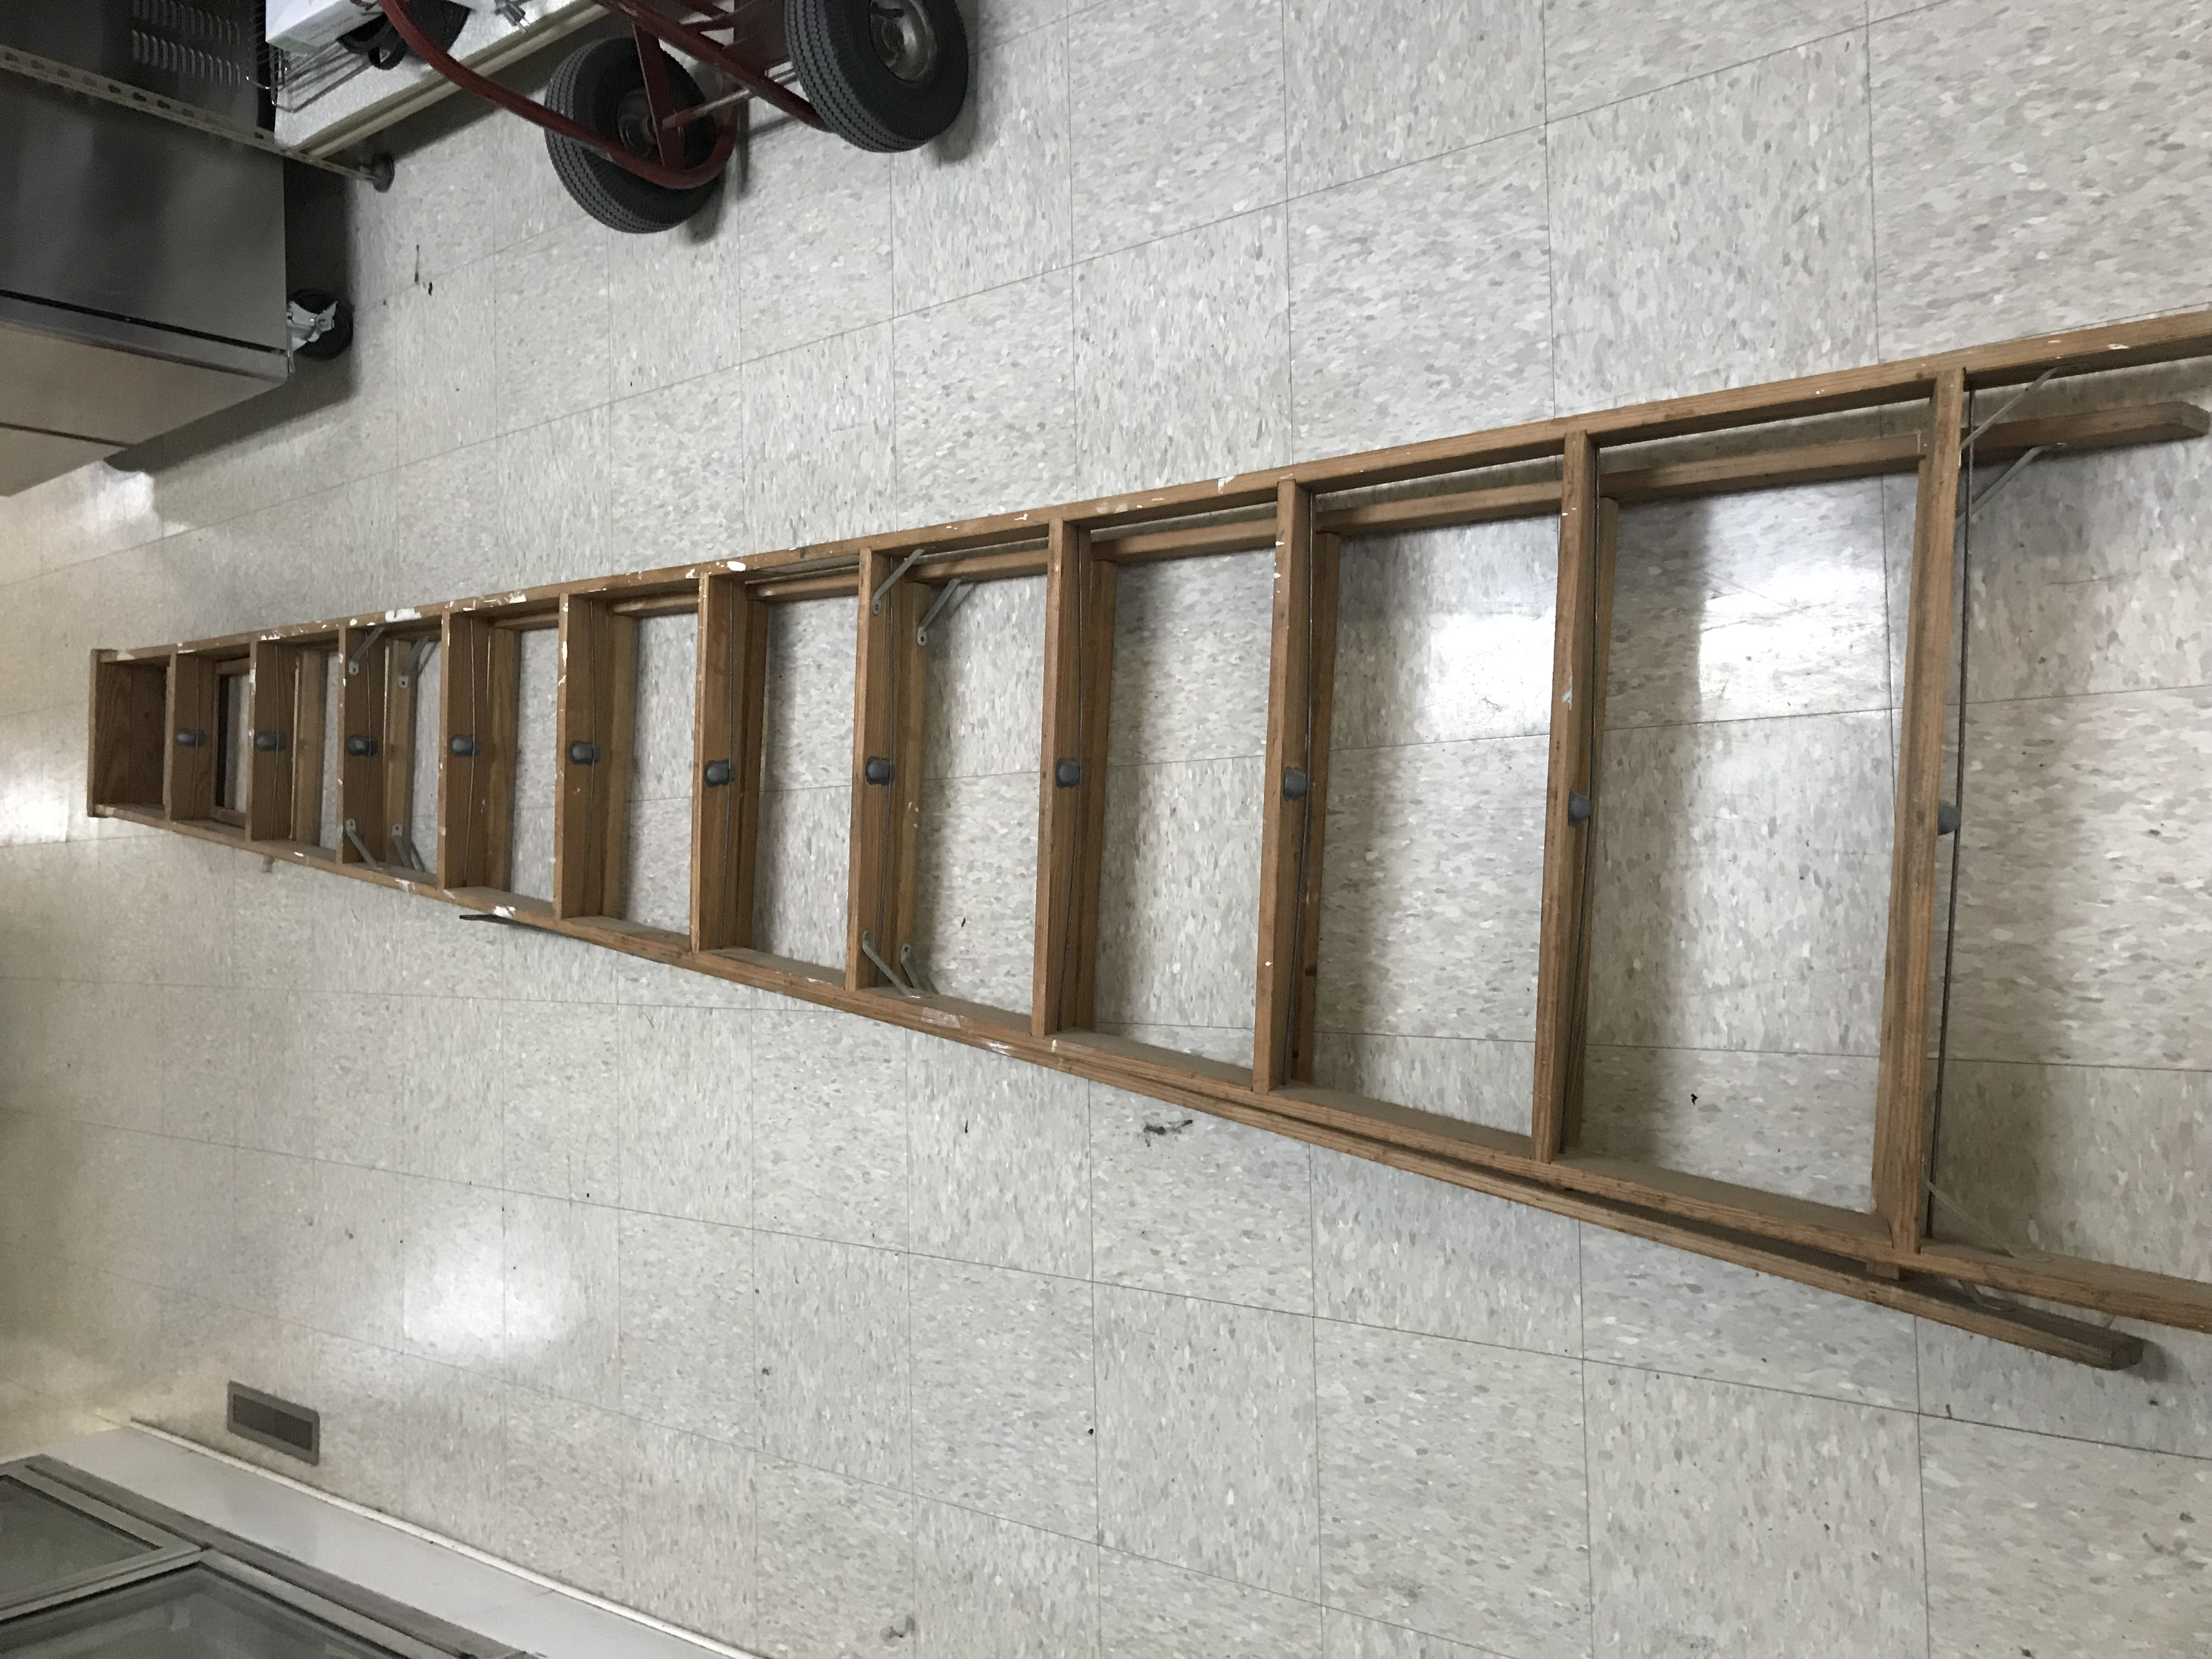 12-ft.-Wooden-Step-Ladder.jpg